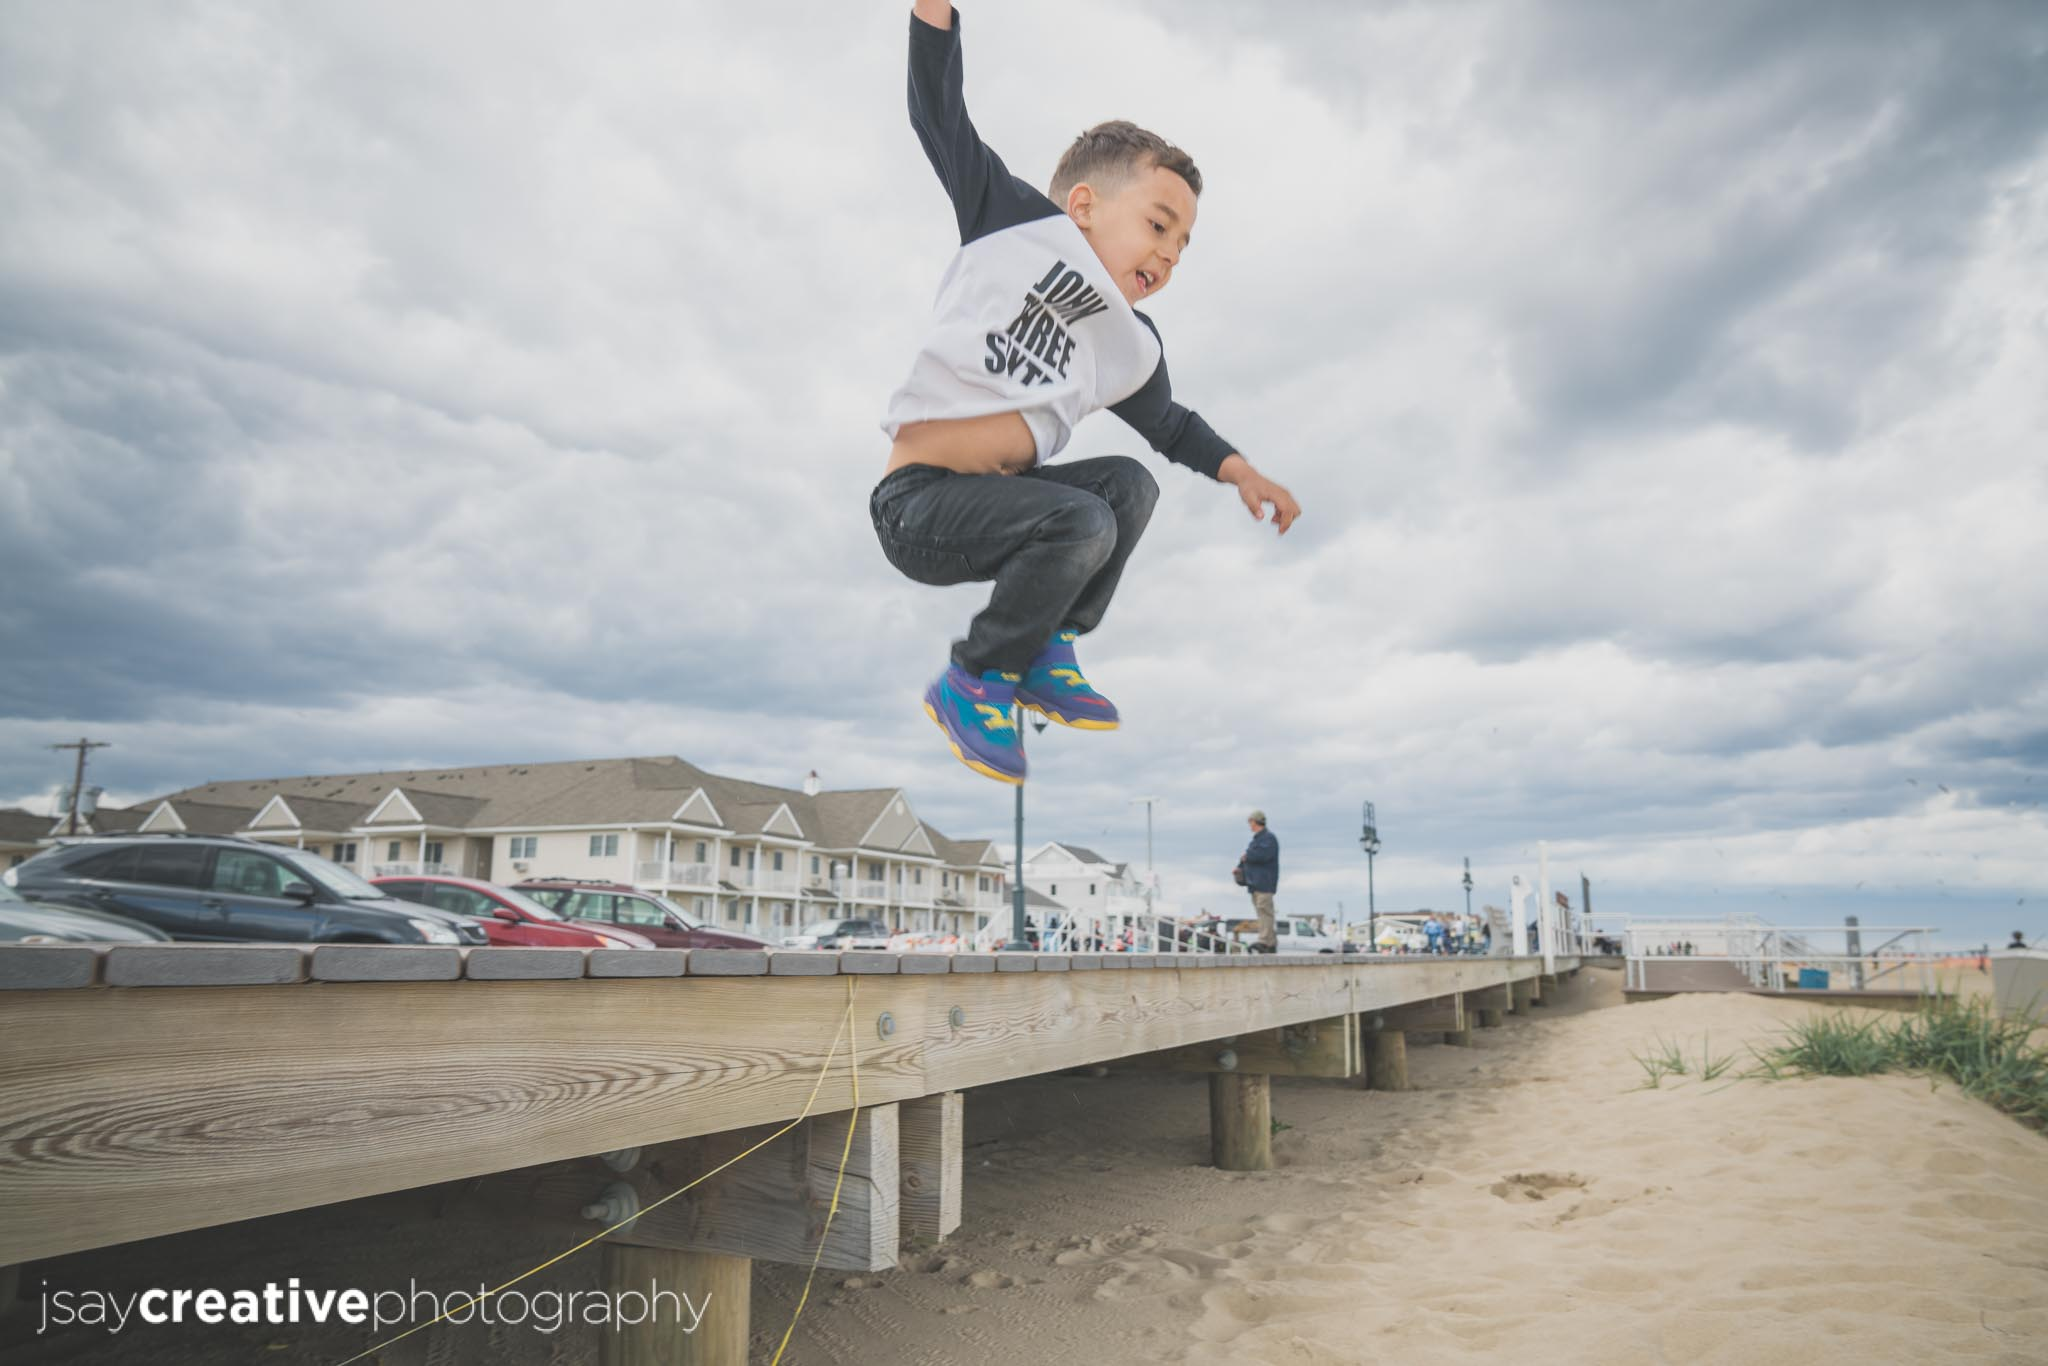 Adorable, Baby, Beach, Beautiful Family, Belmar, Belmar Beach, Boy Jumping Off The Board Walk, Children, Family, Family at Belmar Beach, Family at the Beach, Family at the Jersey Shore, Jersey Shore, New Jersey, Ocean, Son, shore